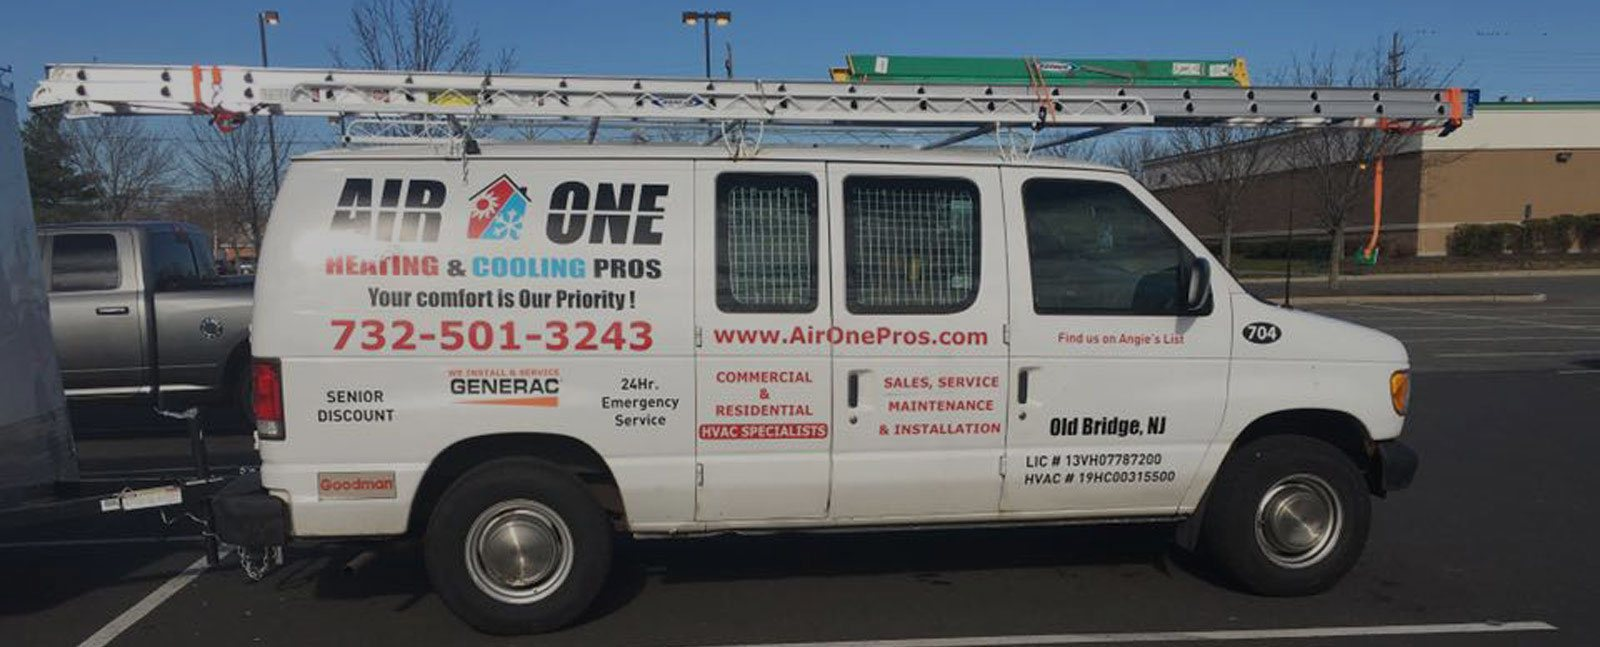 AFFORDABLE HVAC SERVICES IN CENTRAL NJ